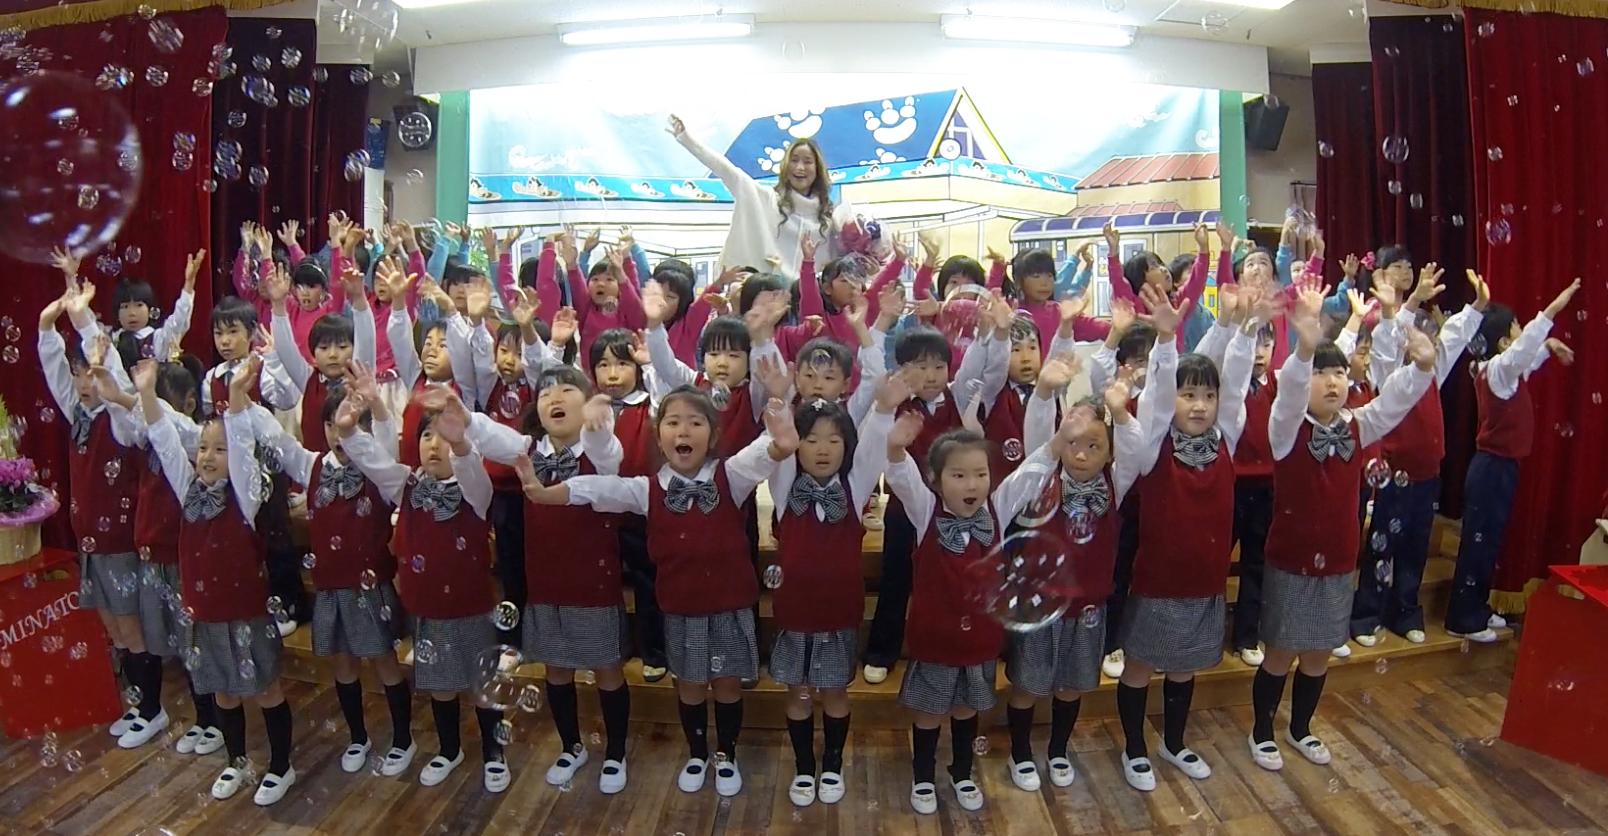 MY DREAM song Minato Preschool performance day!